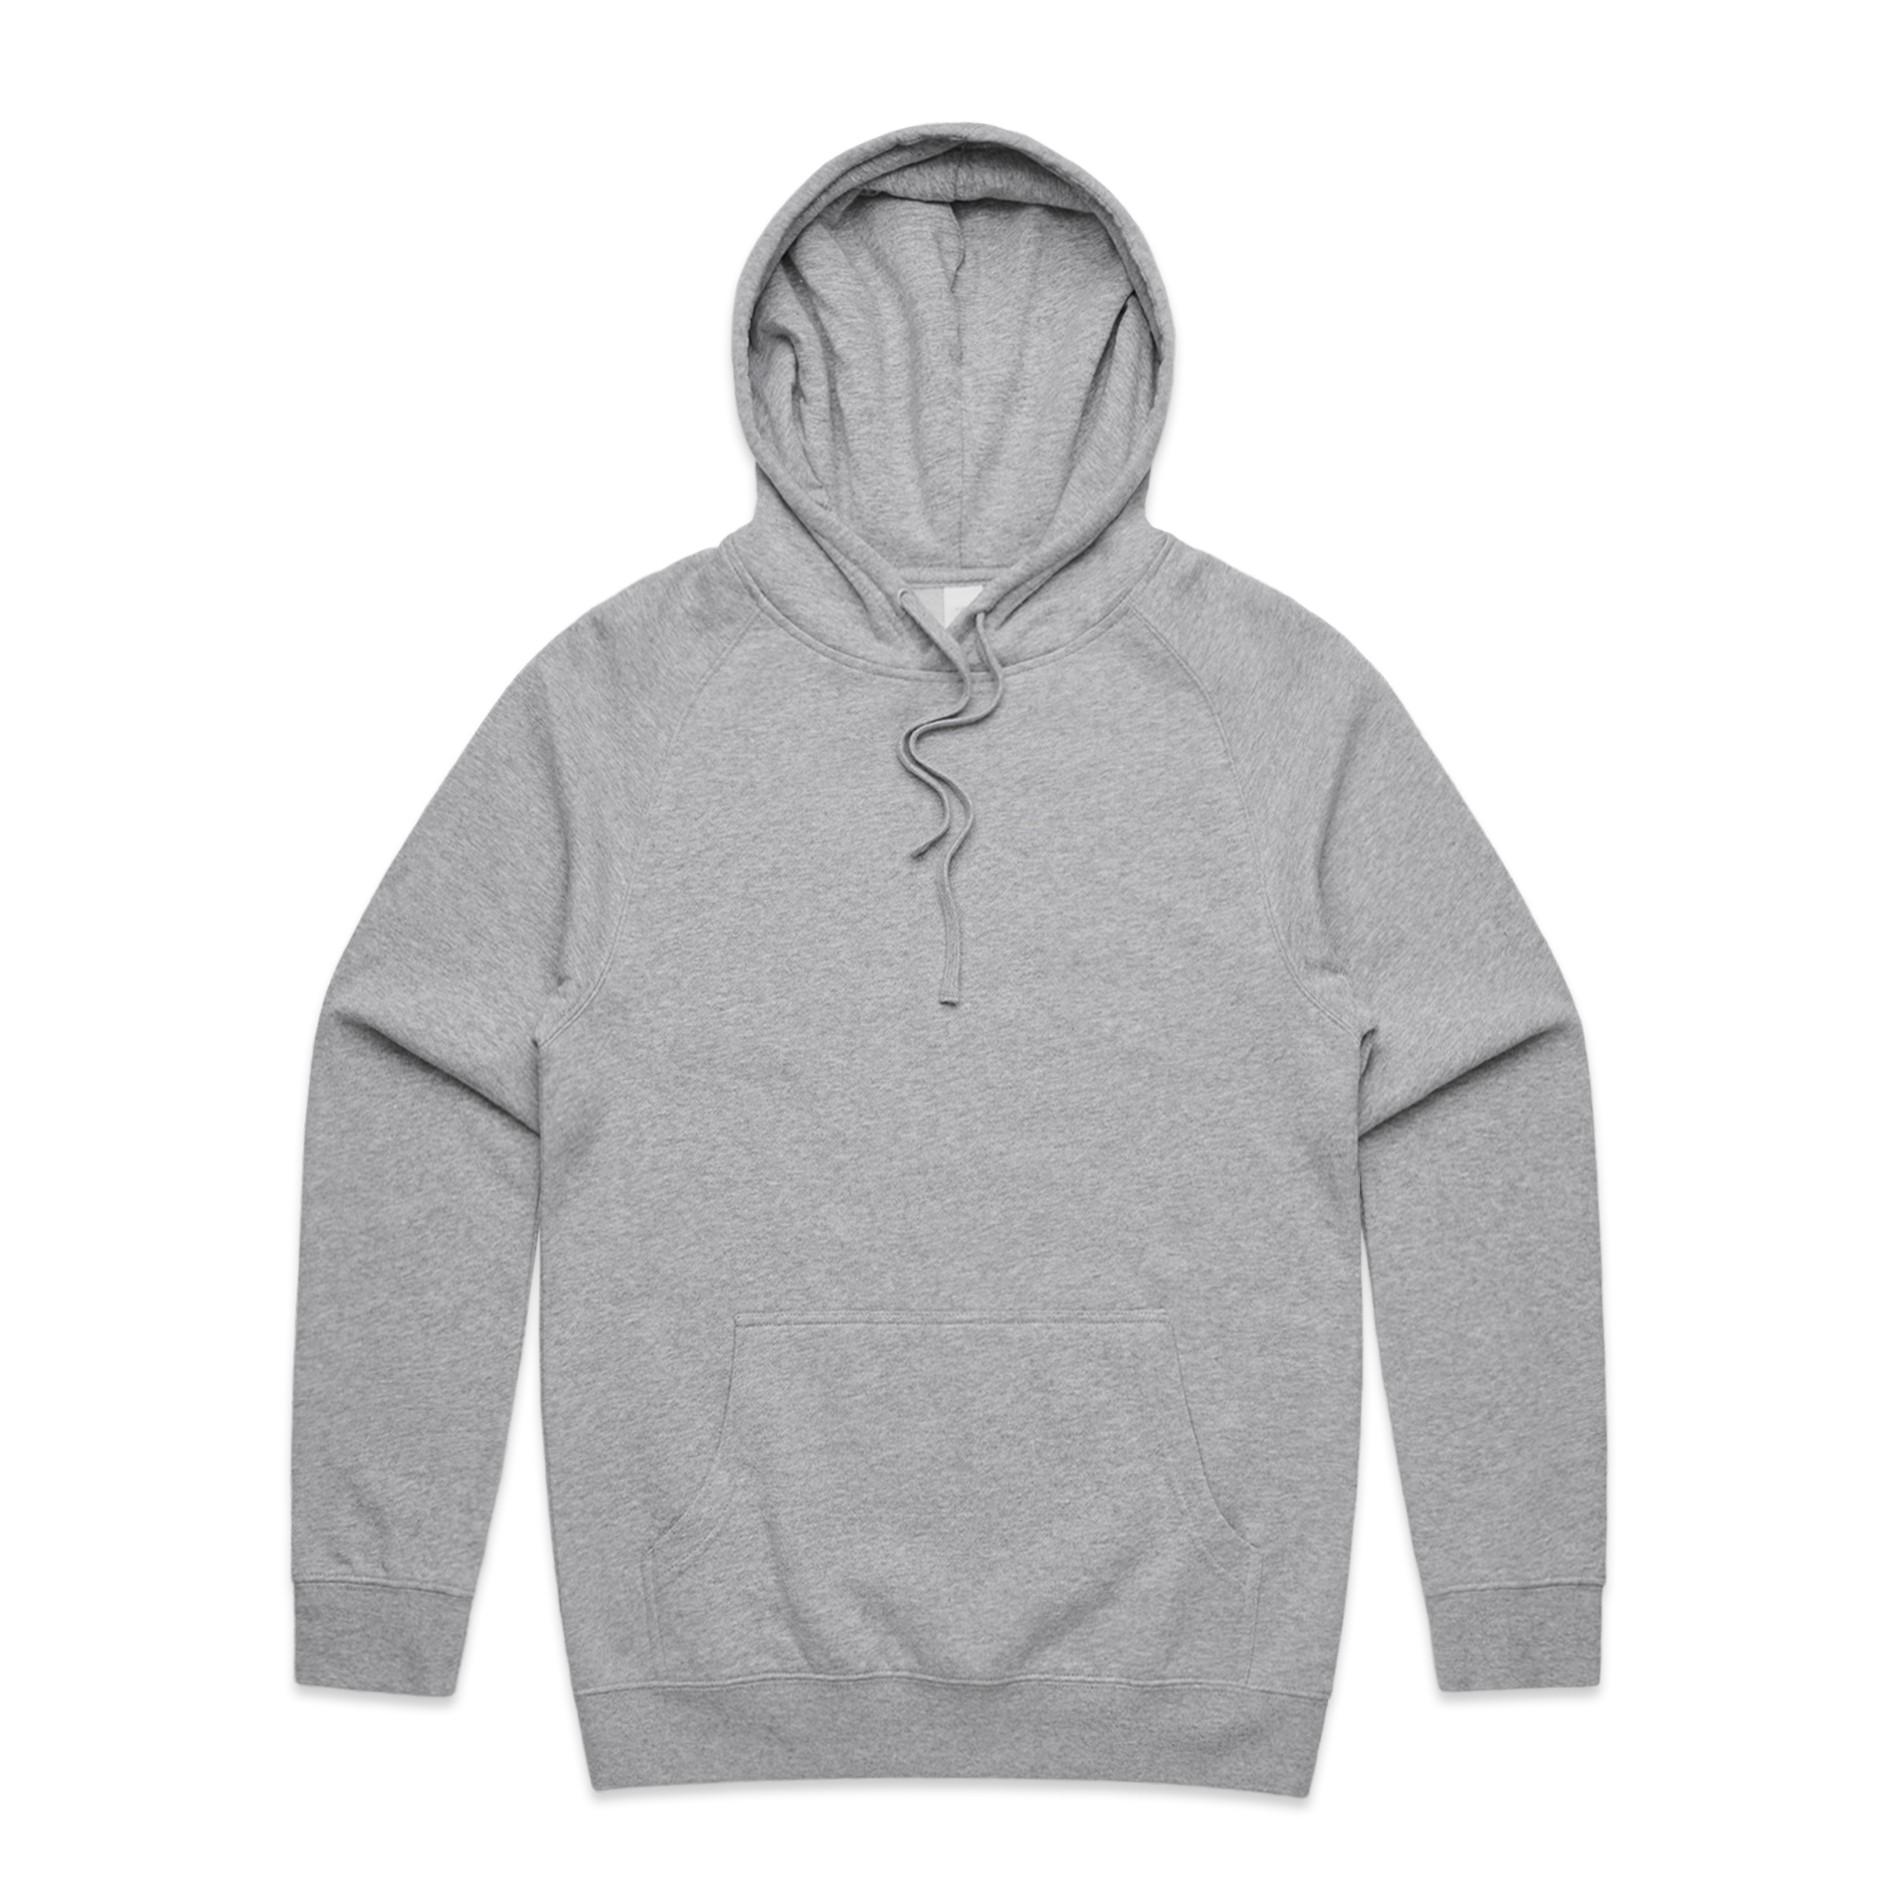 AS Colour Oversized Supply Hood (4XL 5XL)